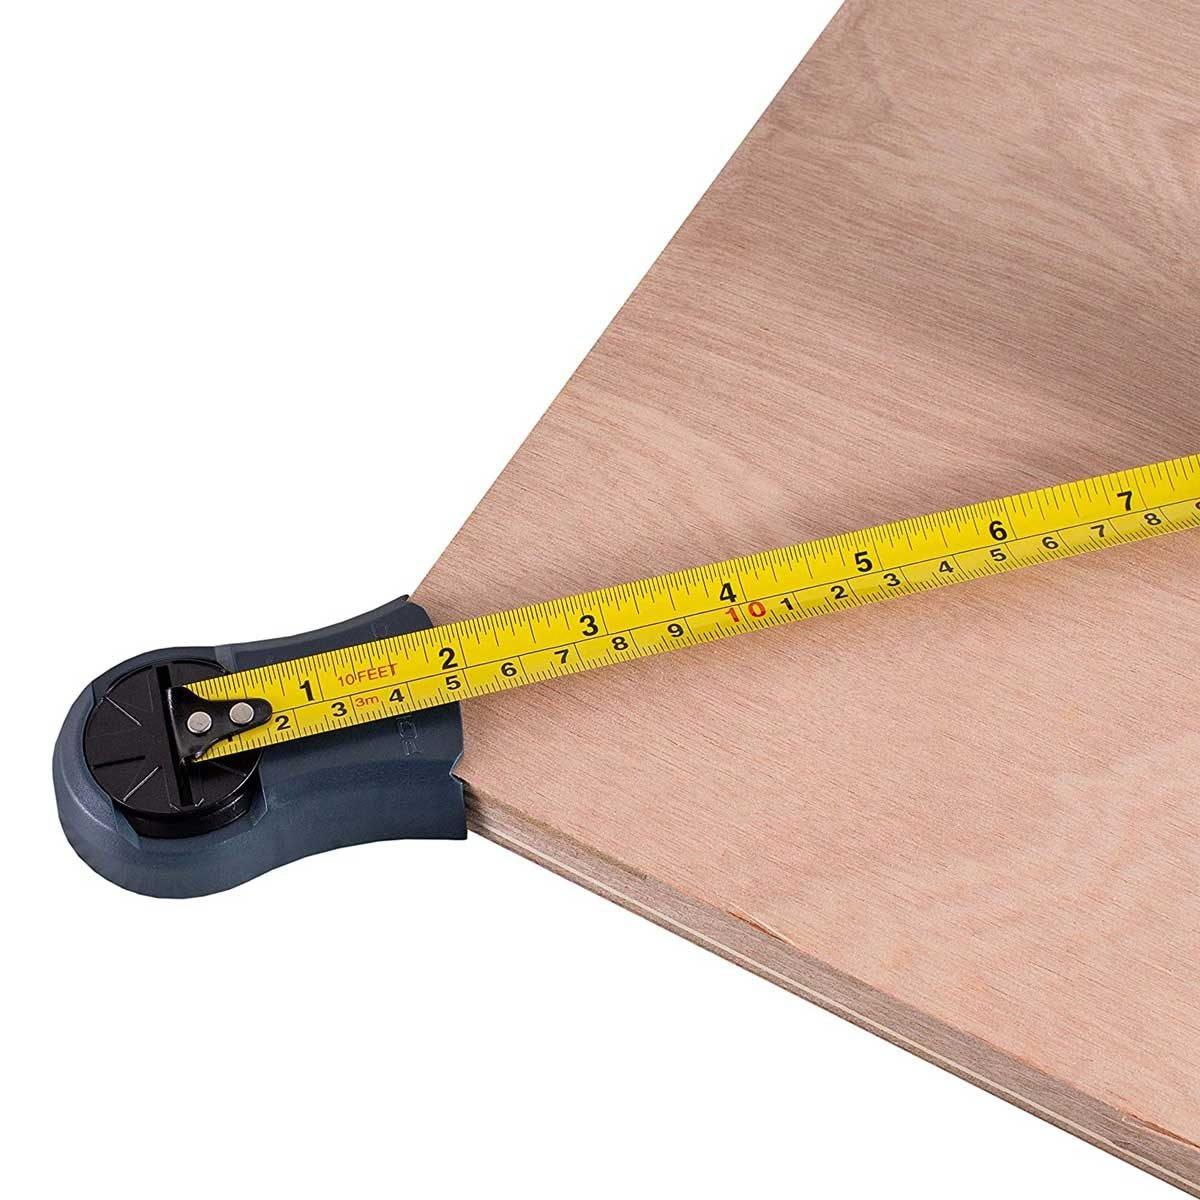 Square check tape measure tool